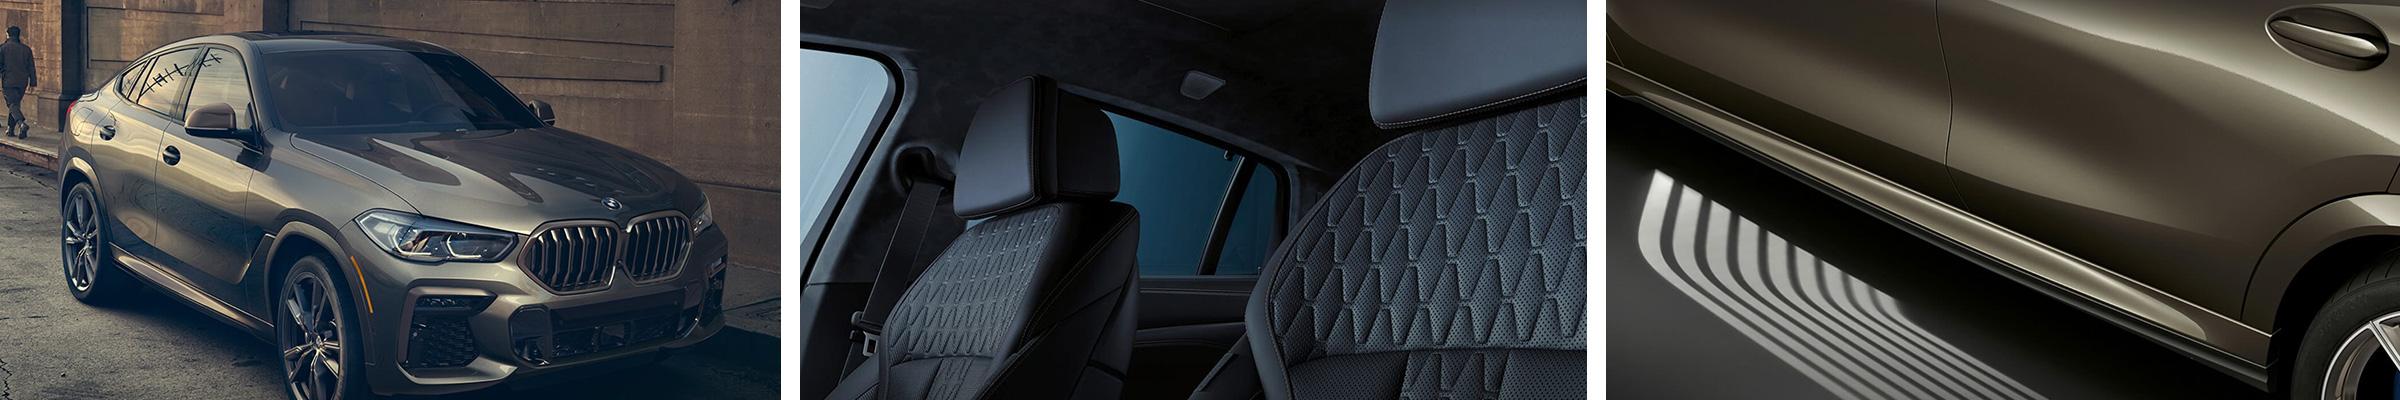 2021 BMW X6 For Sale Wilmington NC | Leland